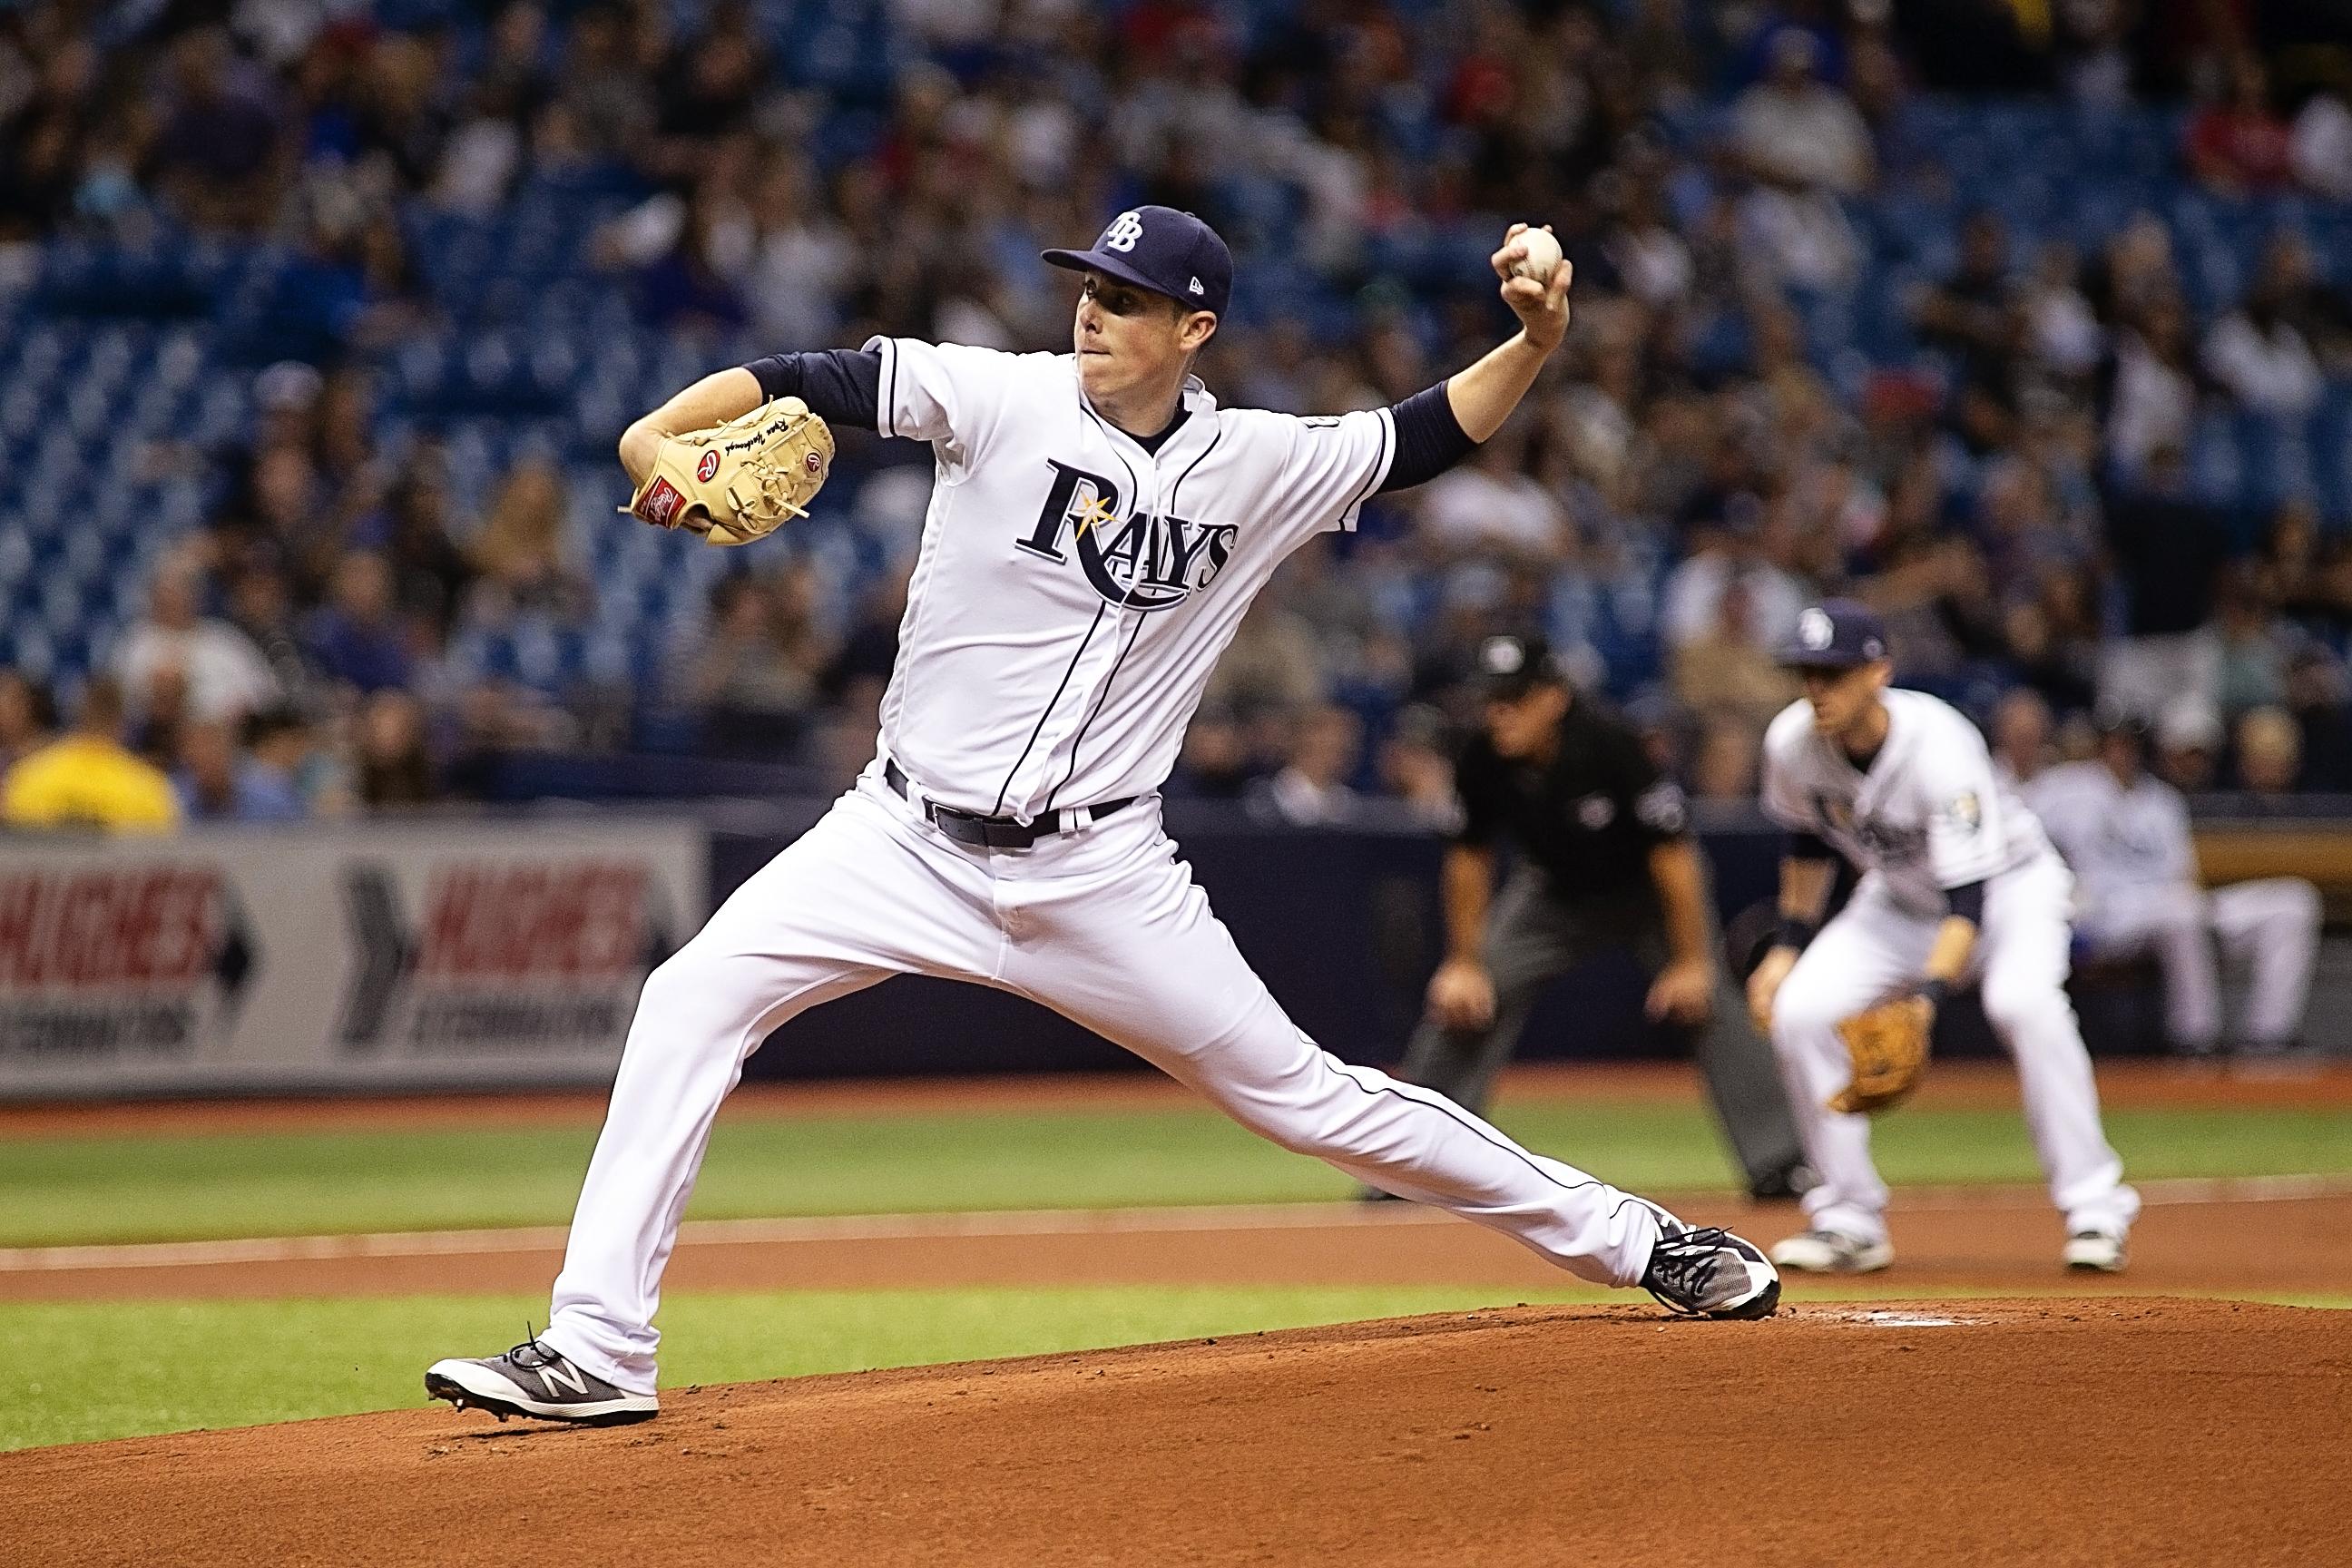 Yarbrough game up four runs in the third inning./CARMEN MANDATO